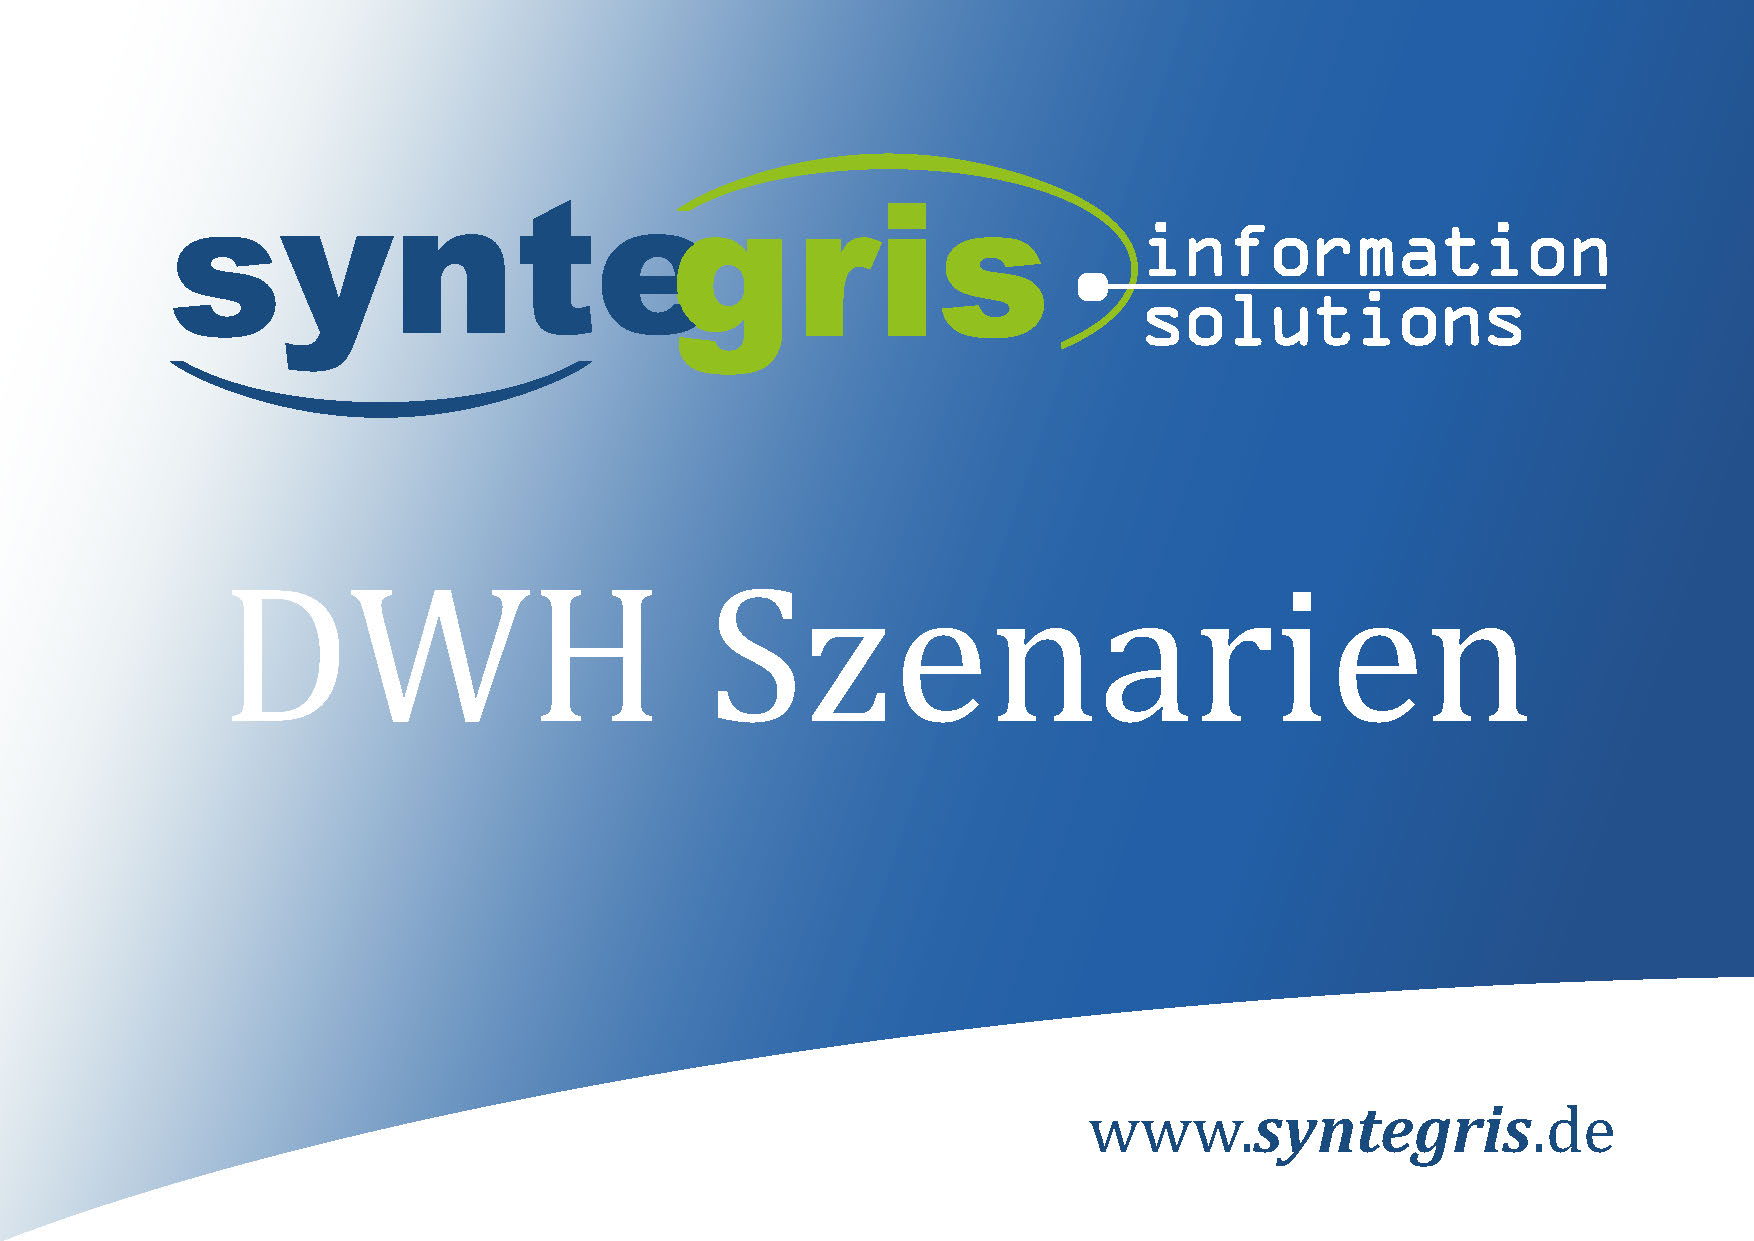 Syntegris DWH